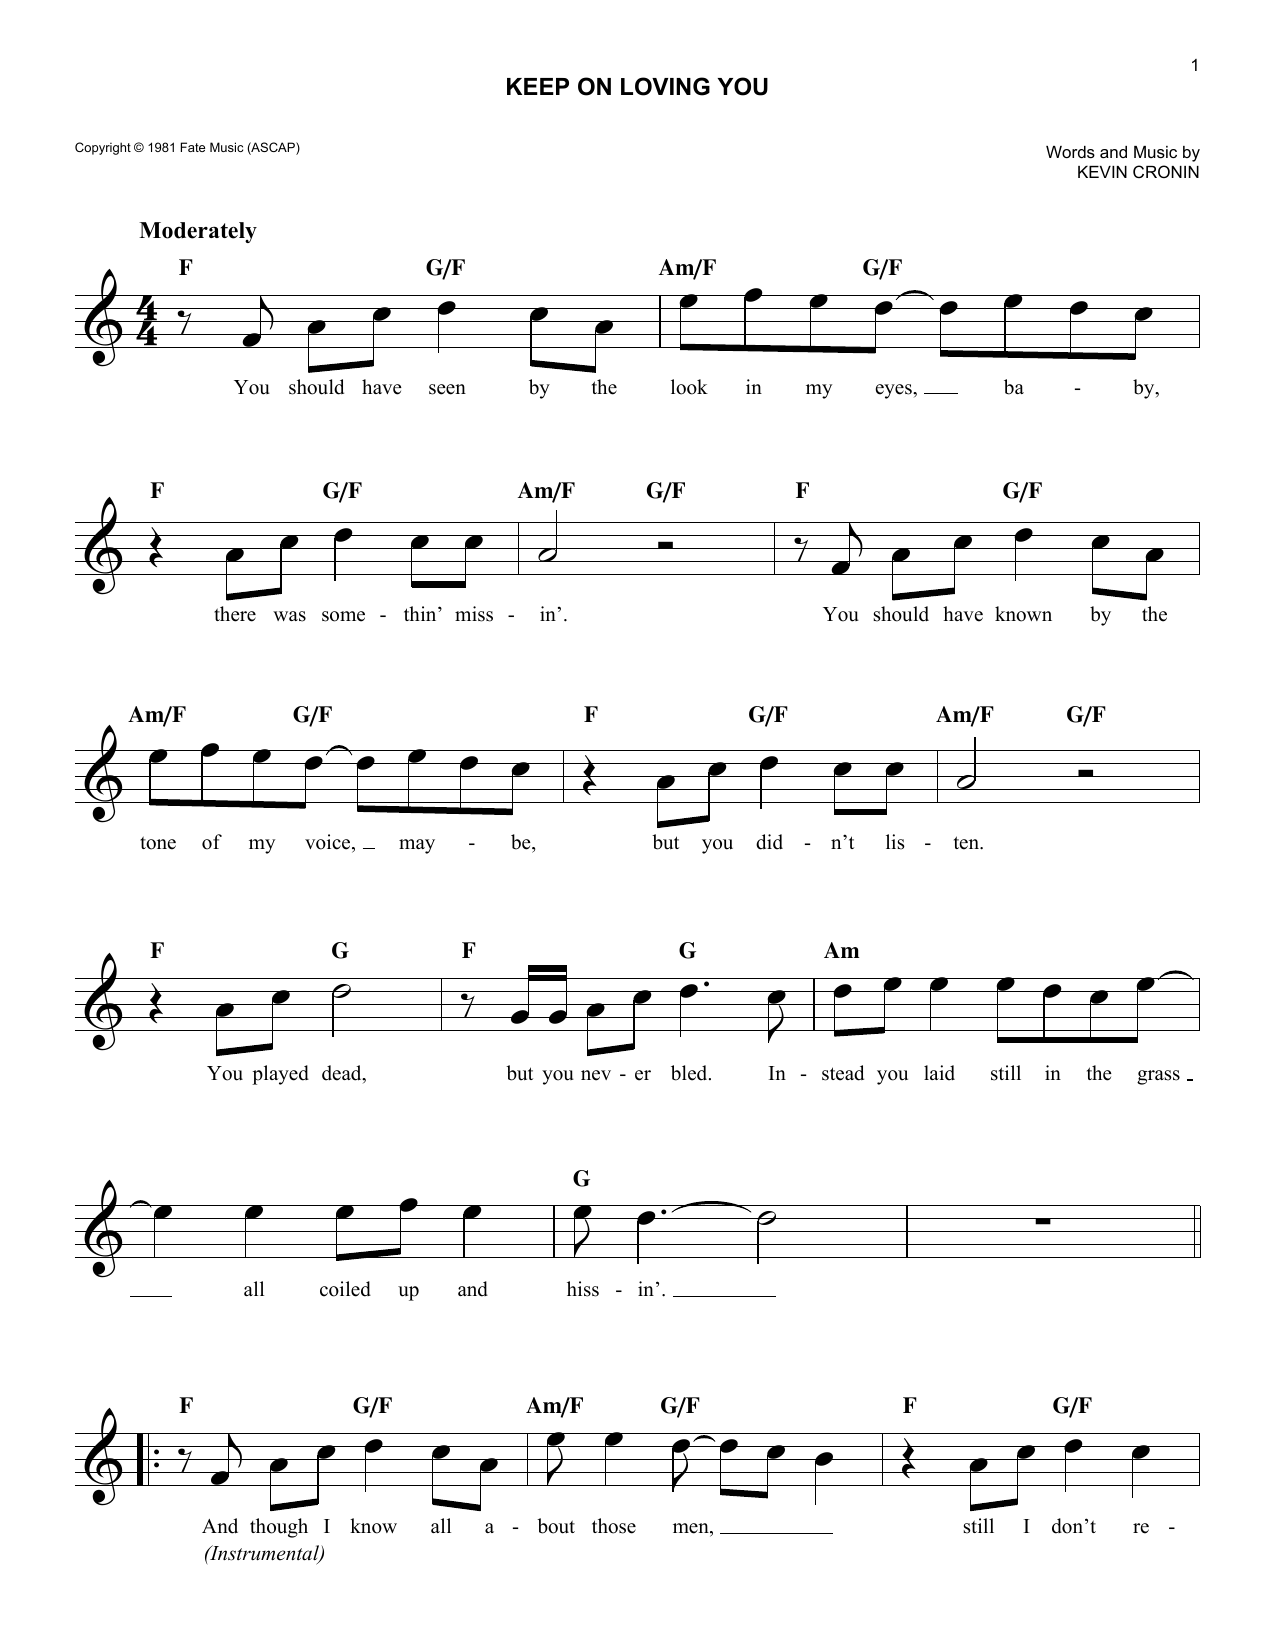 R.E.O. Speedwagon Keep On Loving You Sheet Music Notes, Chords   Download  Printable Lead Sheet / Fake Book PDF Score   SKU 15